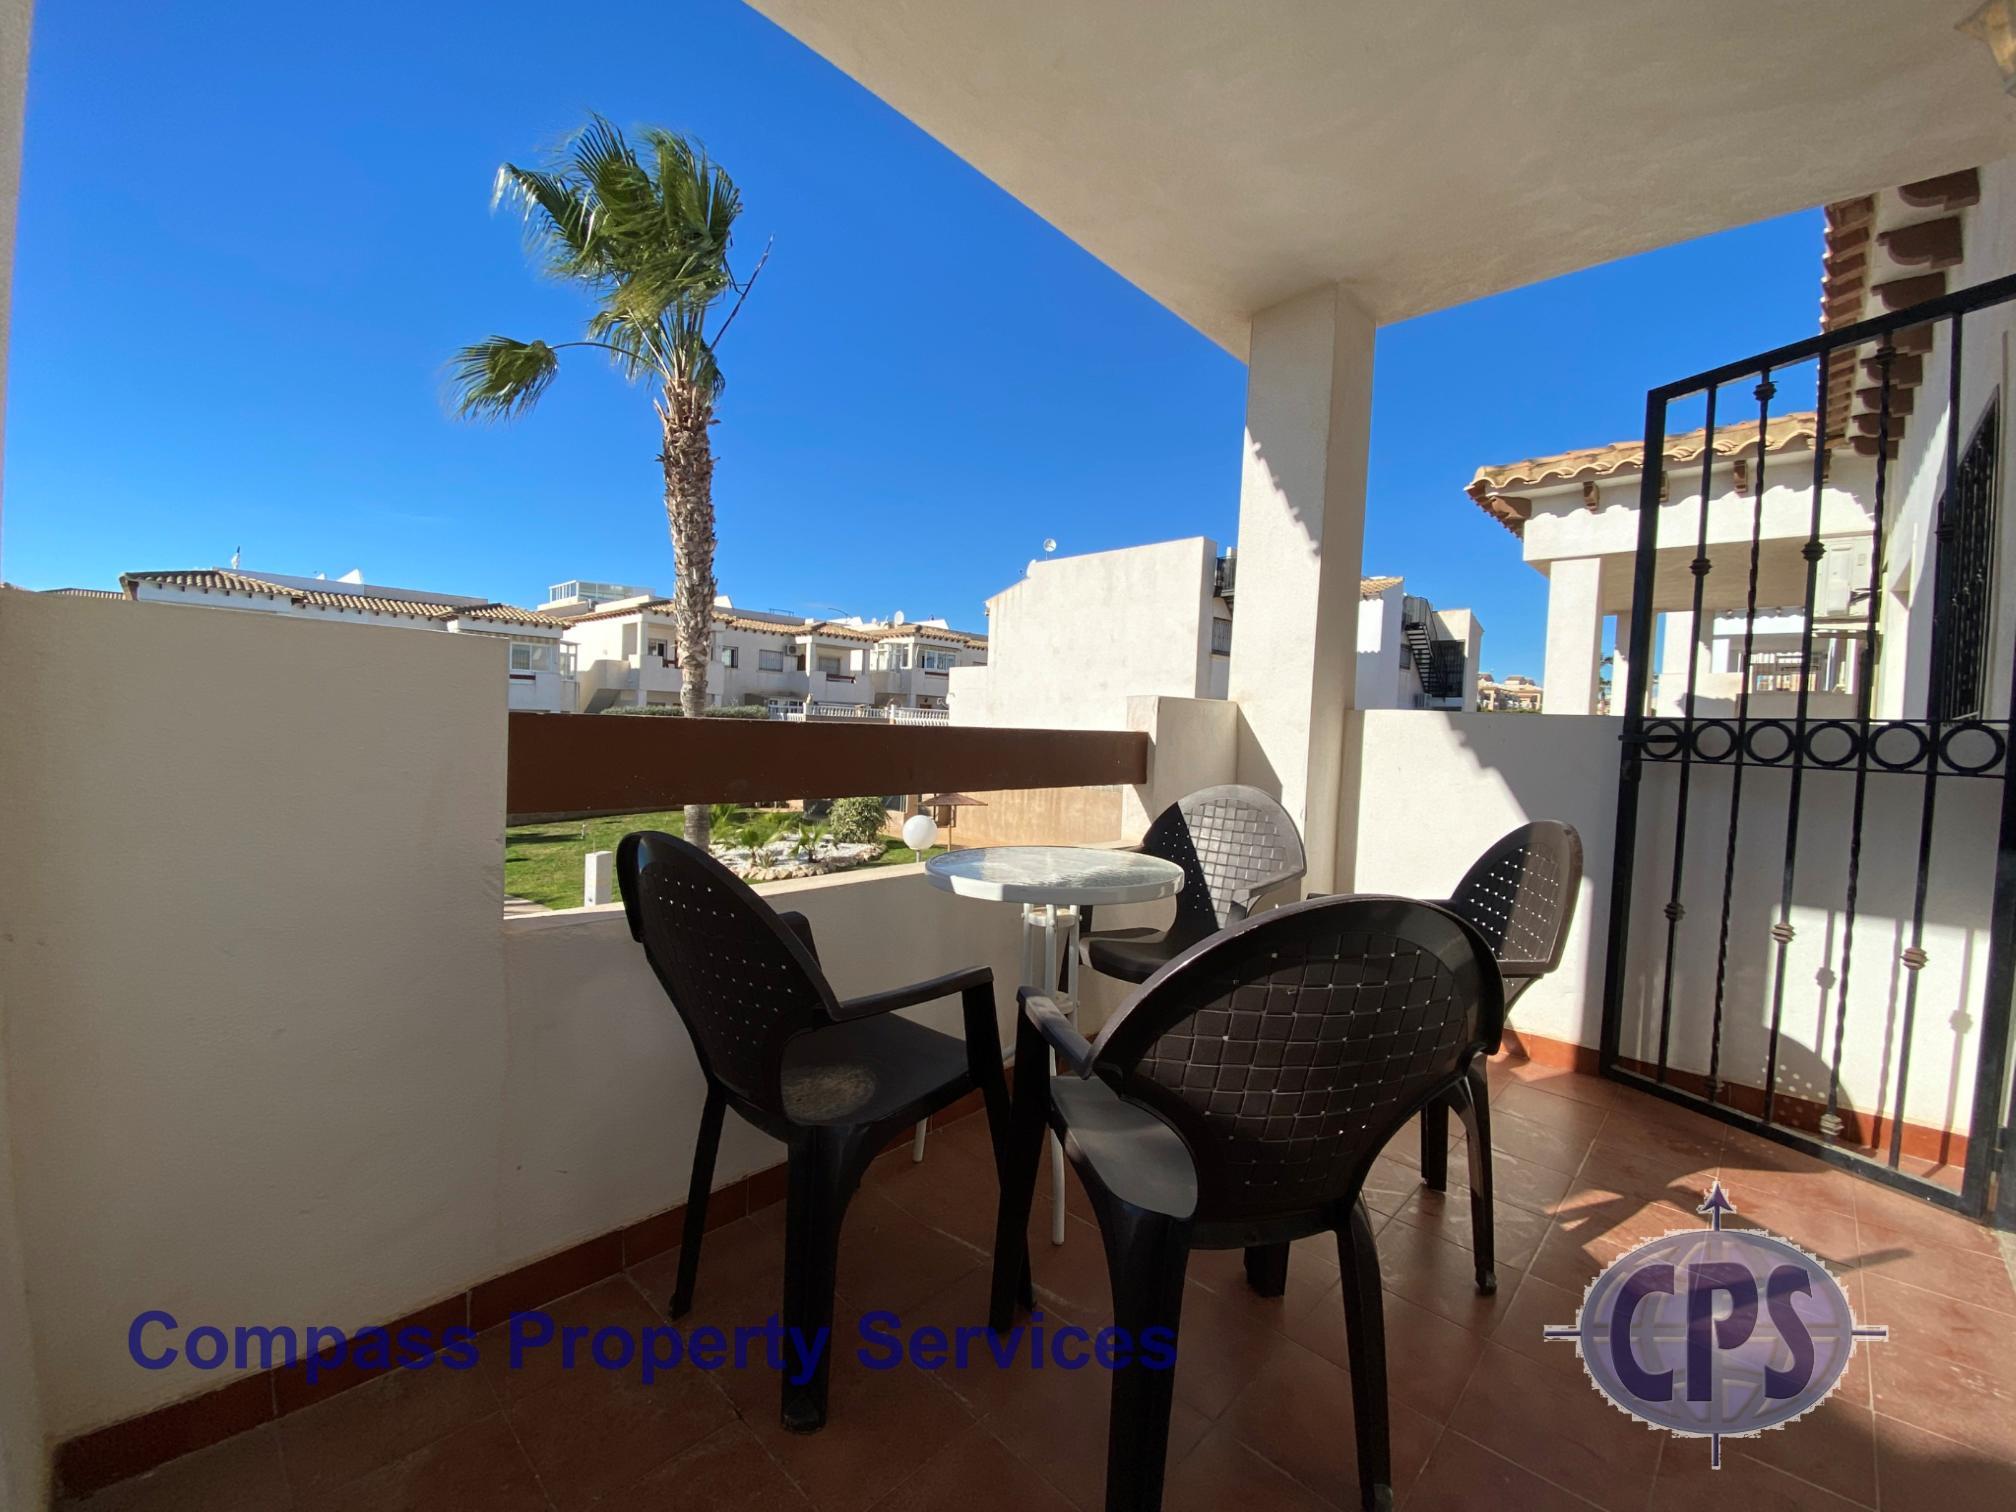 La Cinuelica R3 1st flr apt overlooking pool l149 photo 28556763